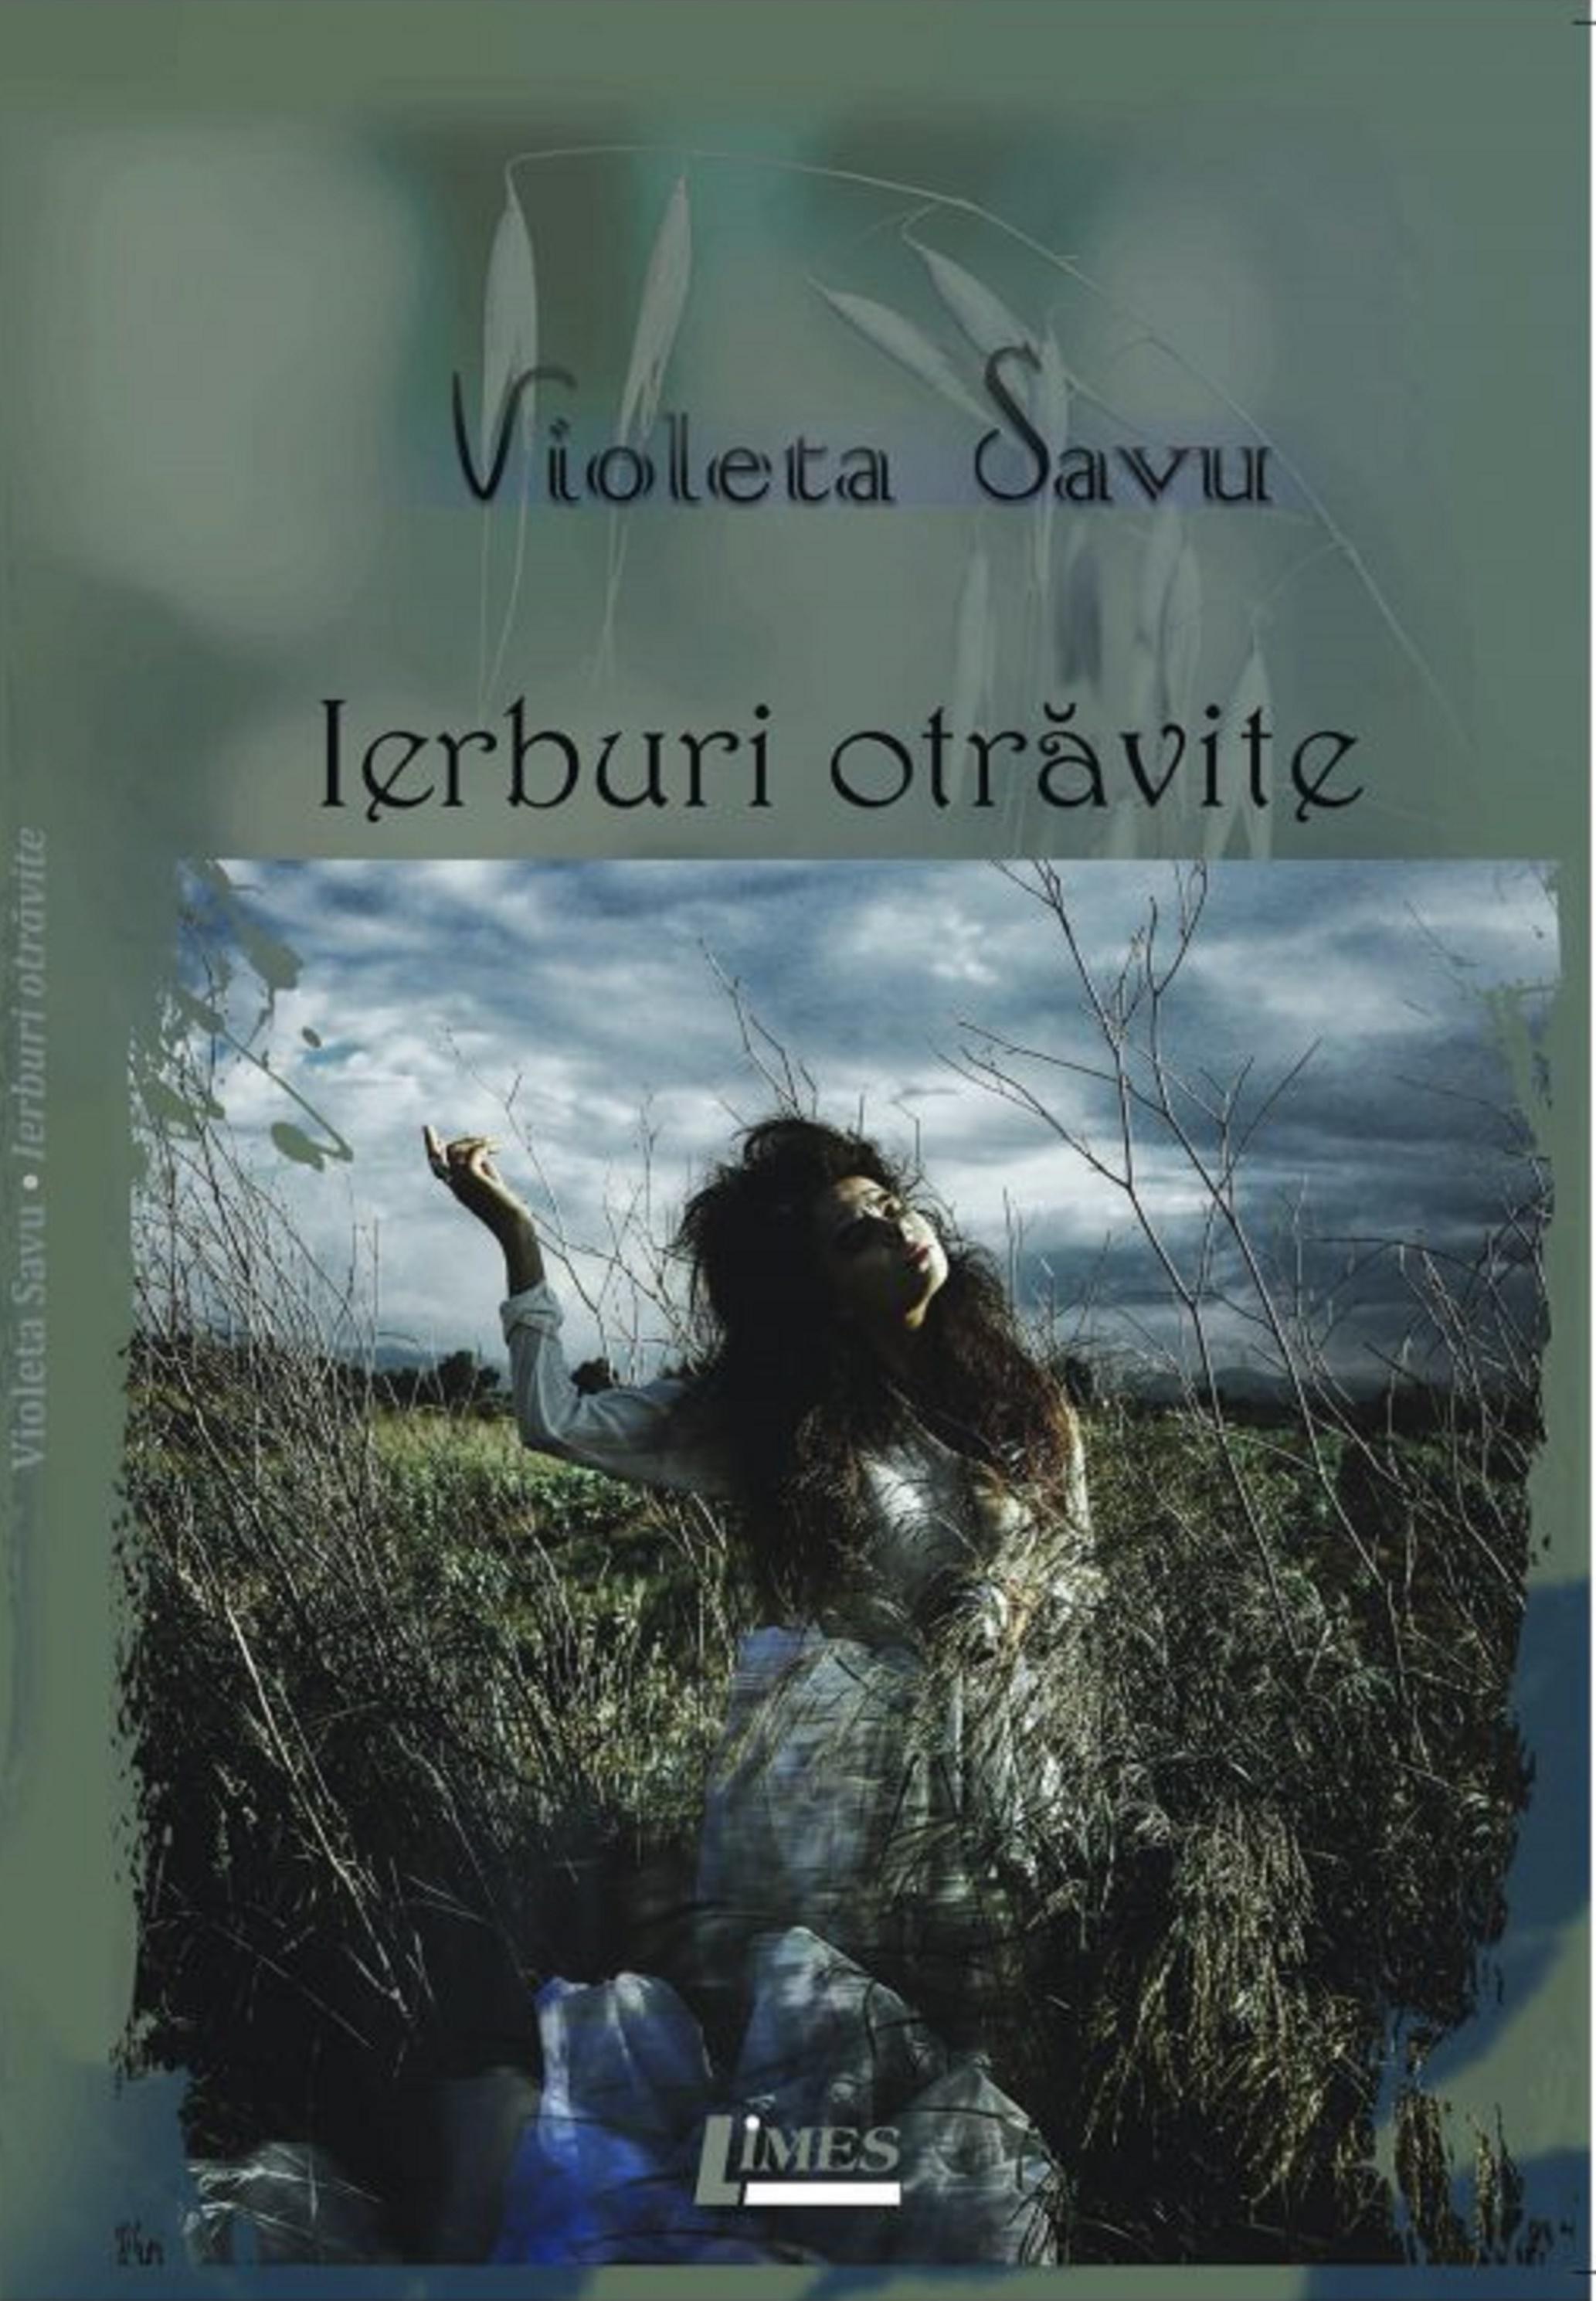 Ierburi otravite   Violeta Savu